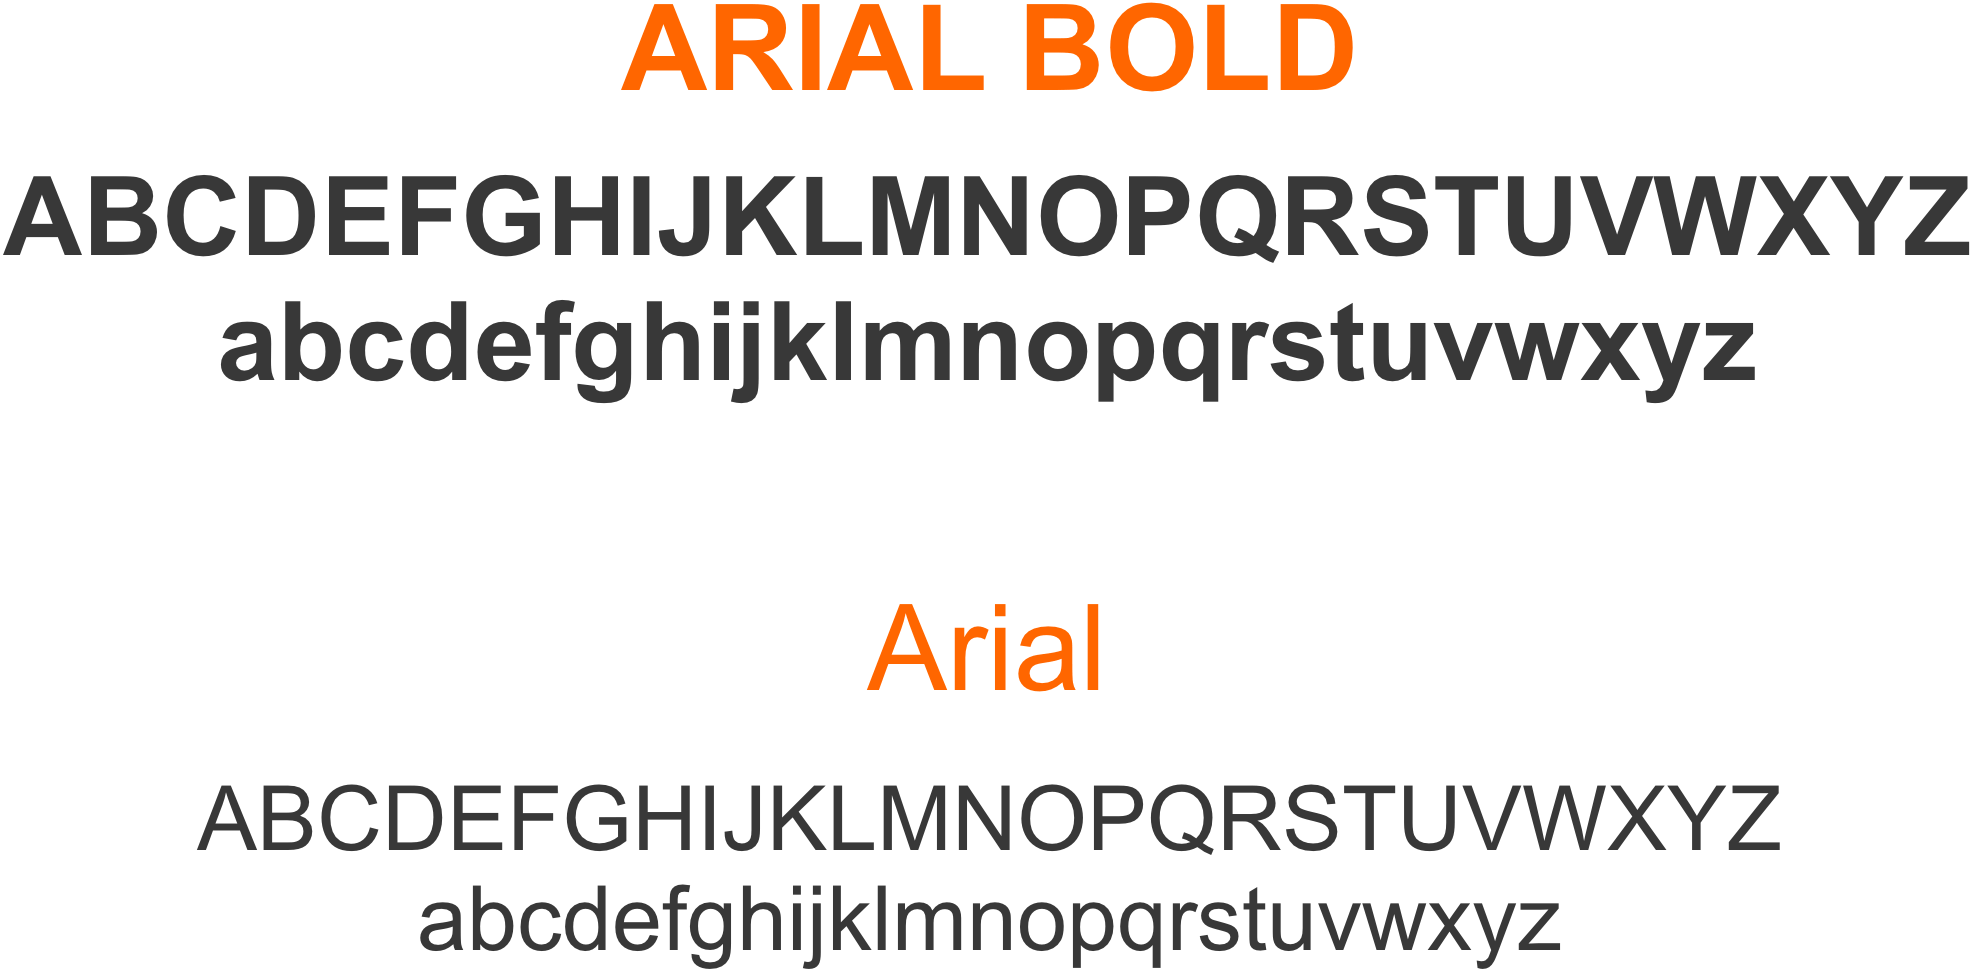 SL-Power-Power-Supplies-Design-Font-Palette